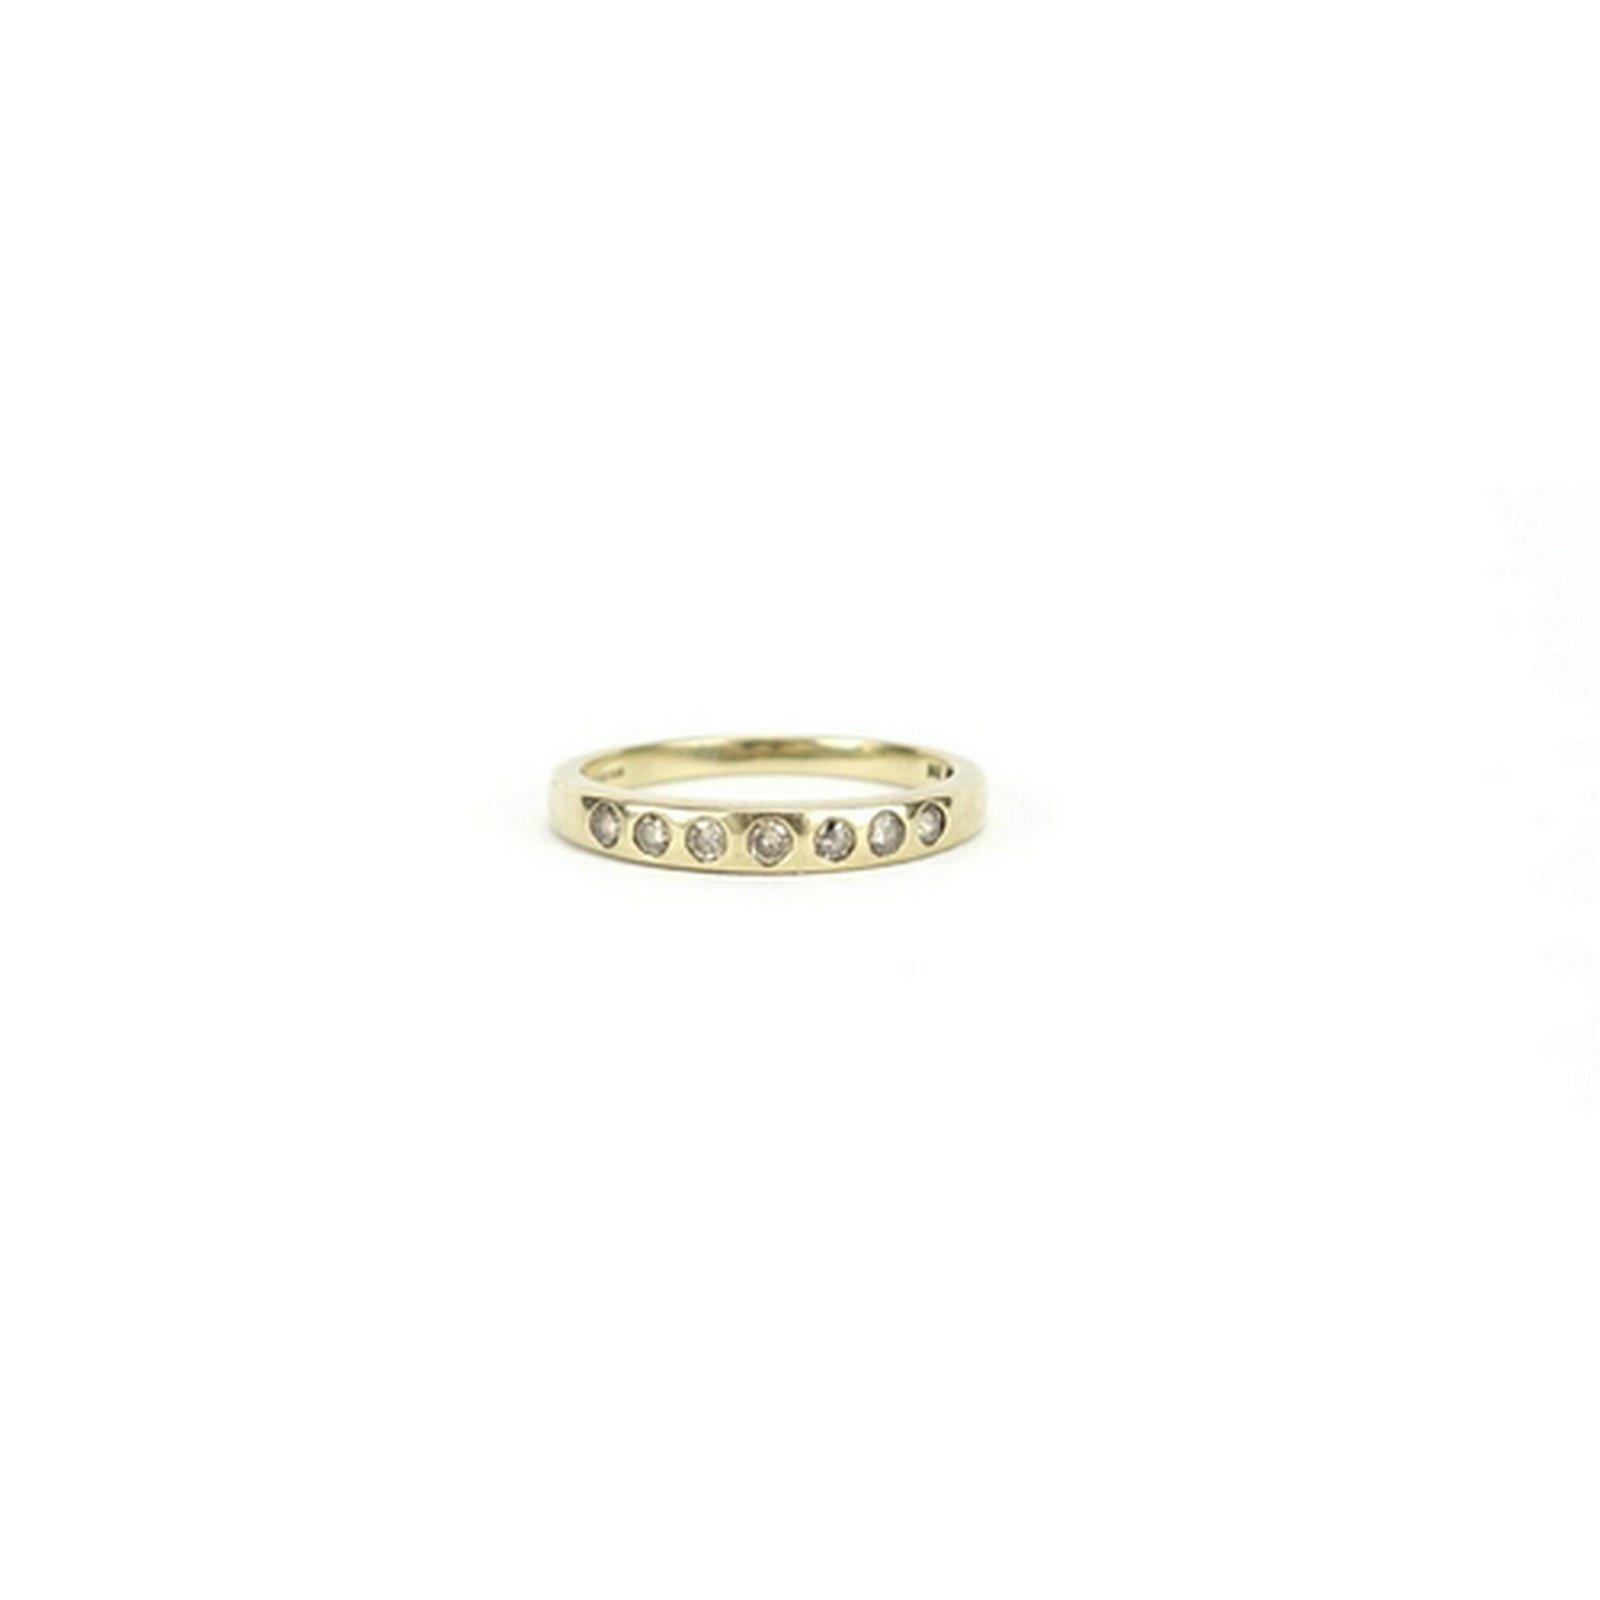 9ct gold diamond half eternity ring, size O, 1.9g